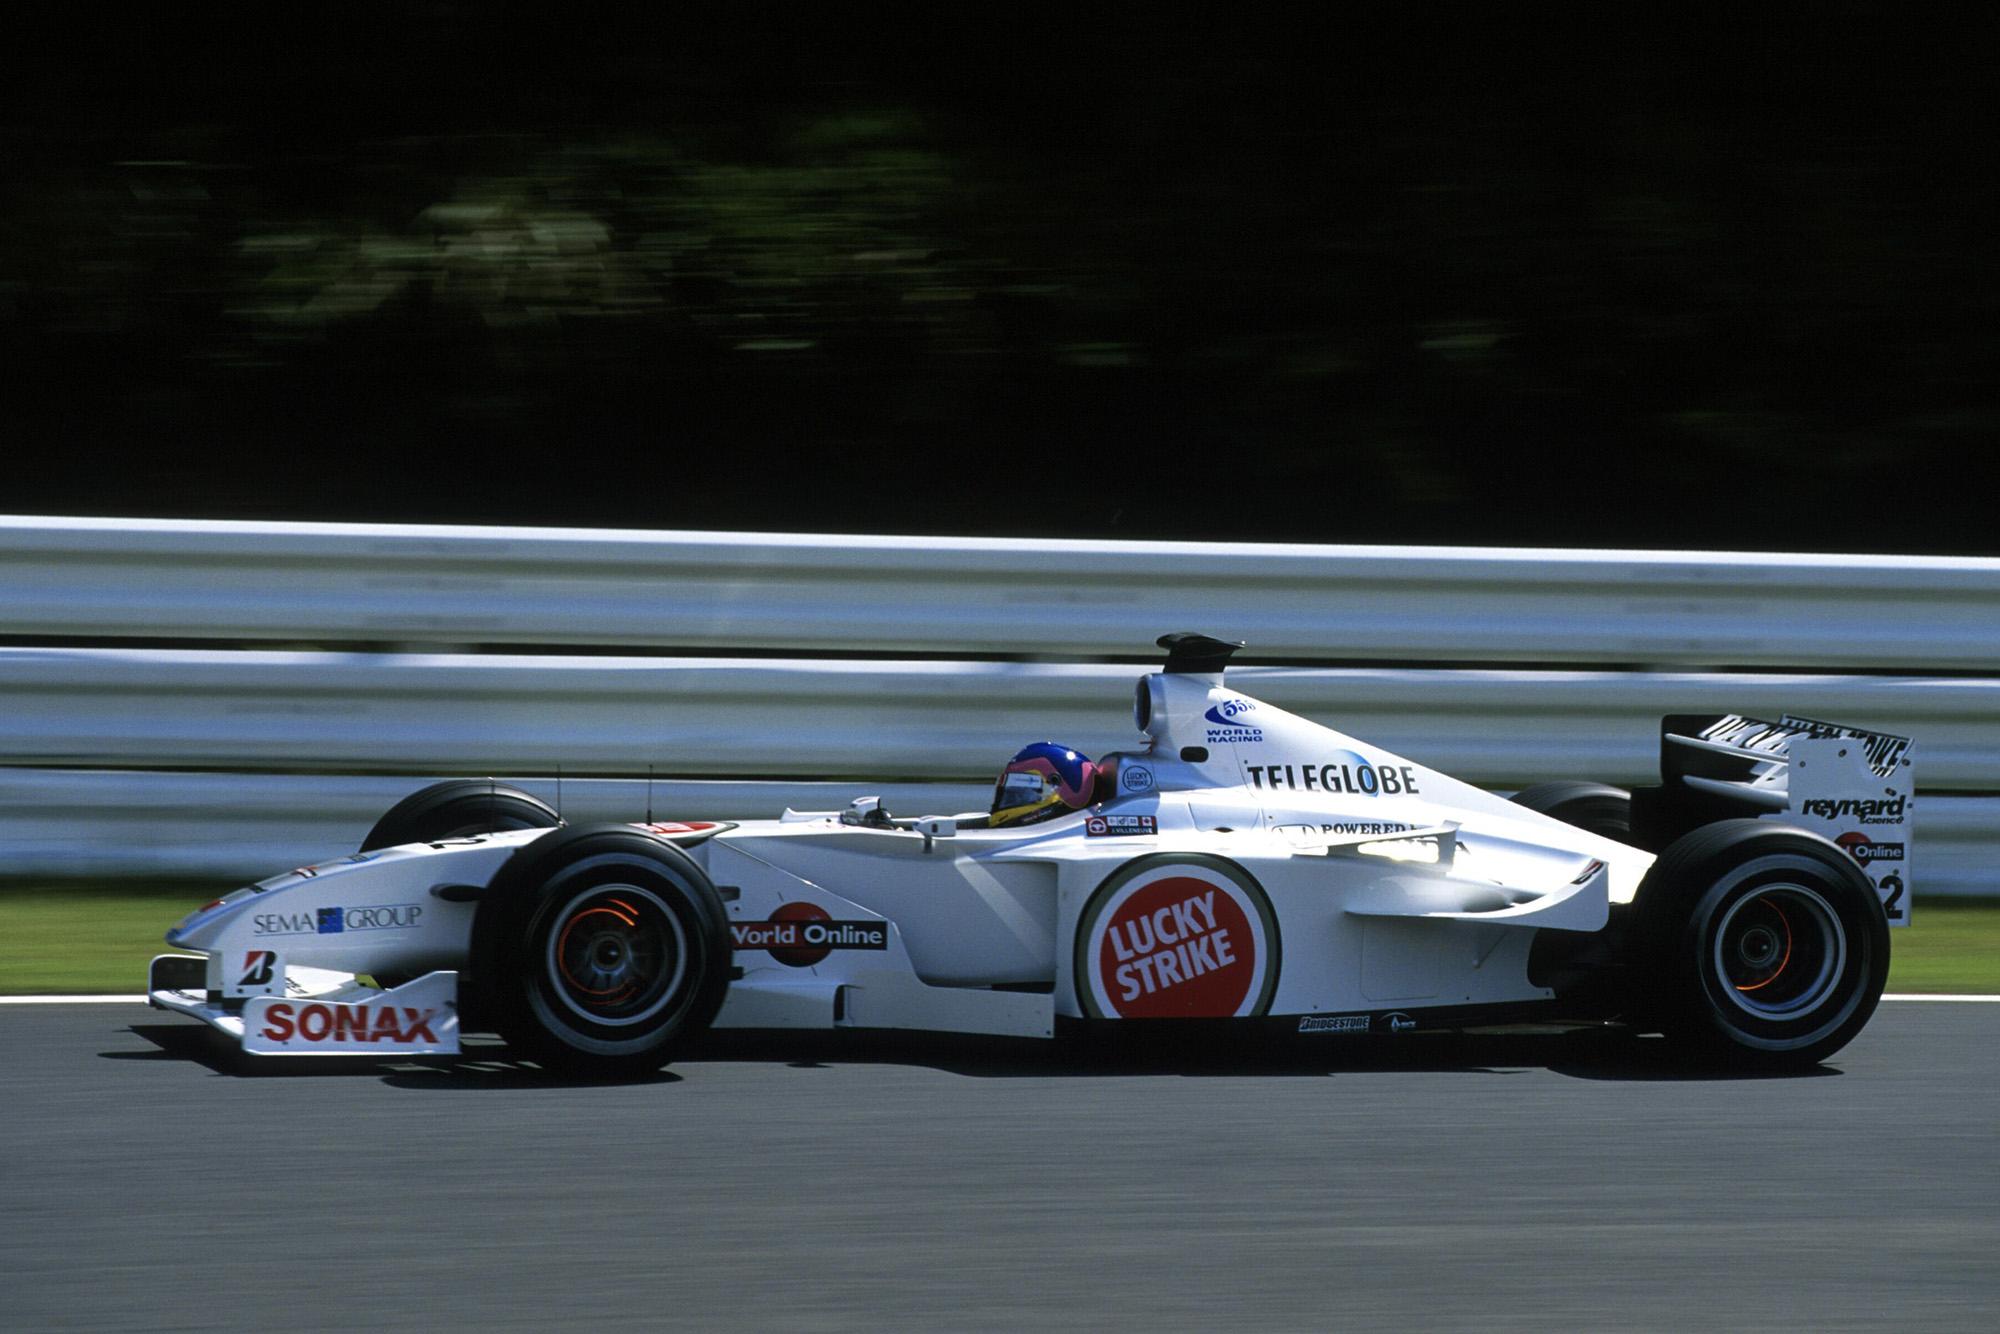 Jacques Villeneuve in the 2000 BAR Honda 002